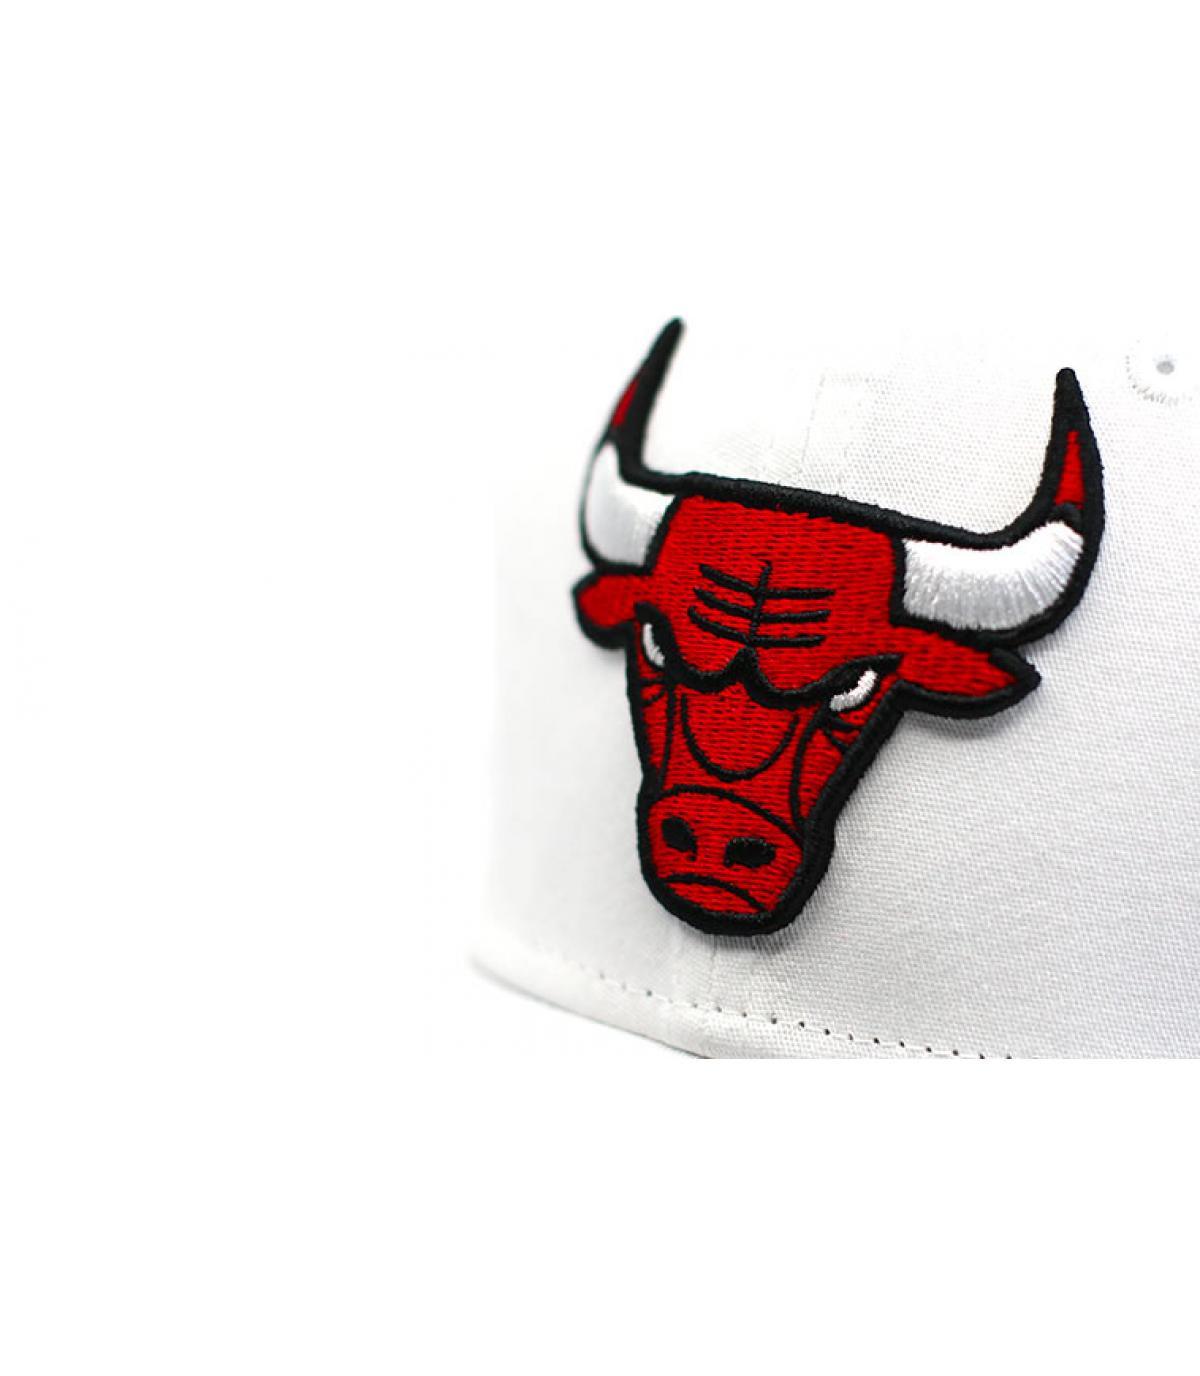 Détails Stretch Snap 9Fifty Bulls - image 3